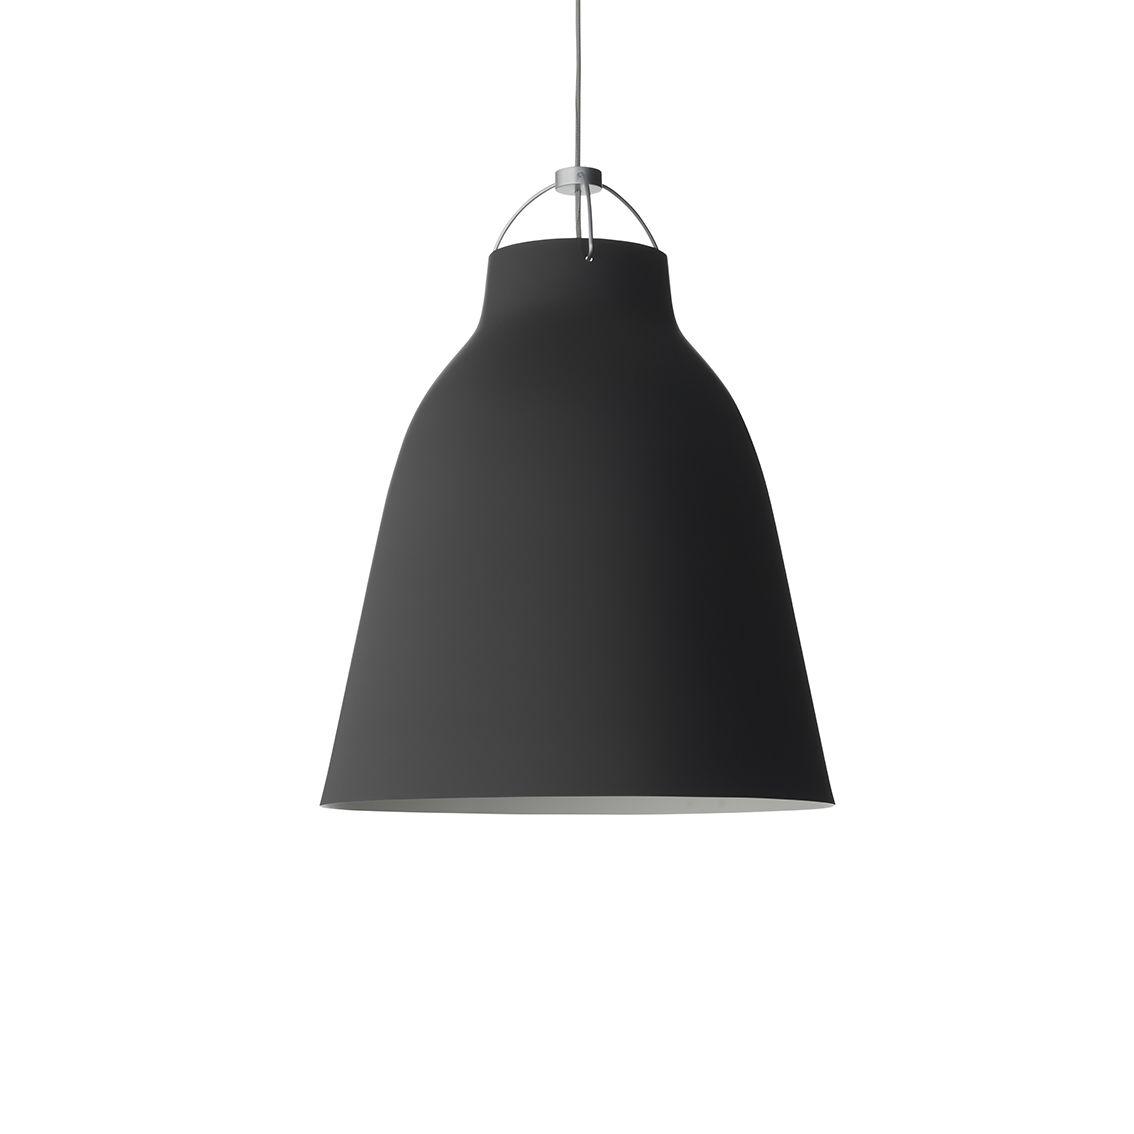 Caravaggio hanglamp Lightyears Ø16 mat zwart